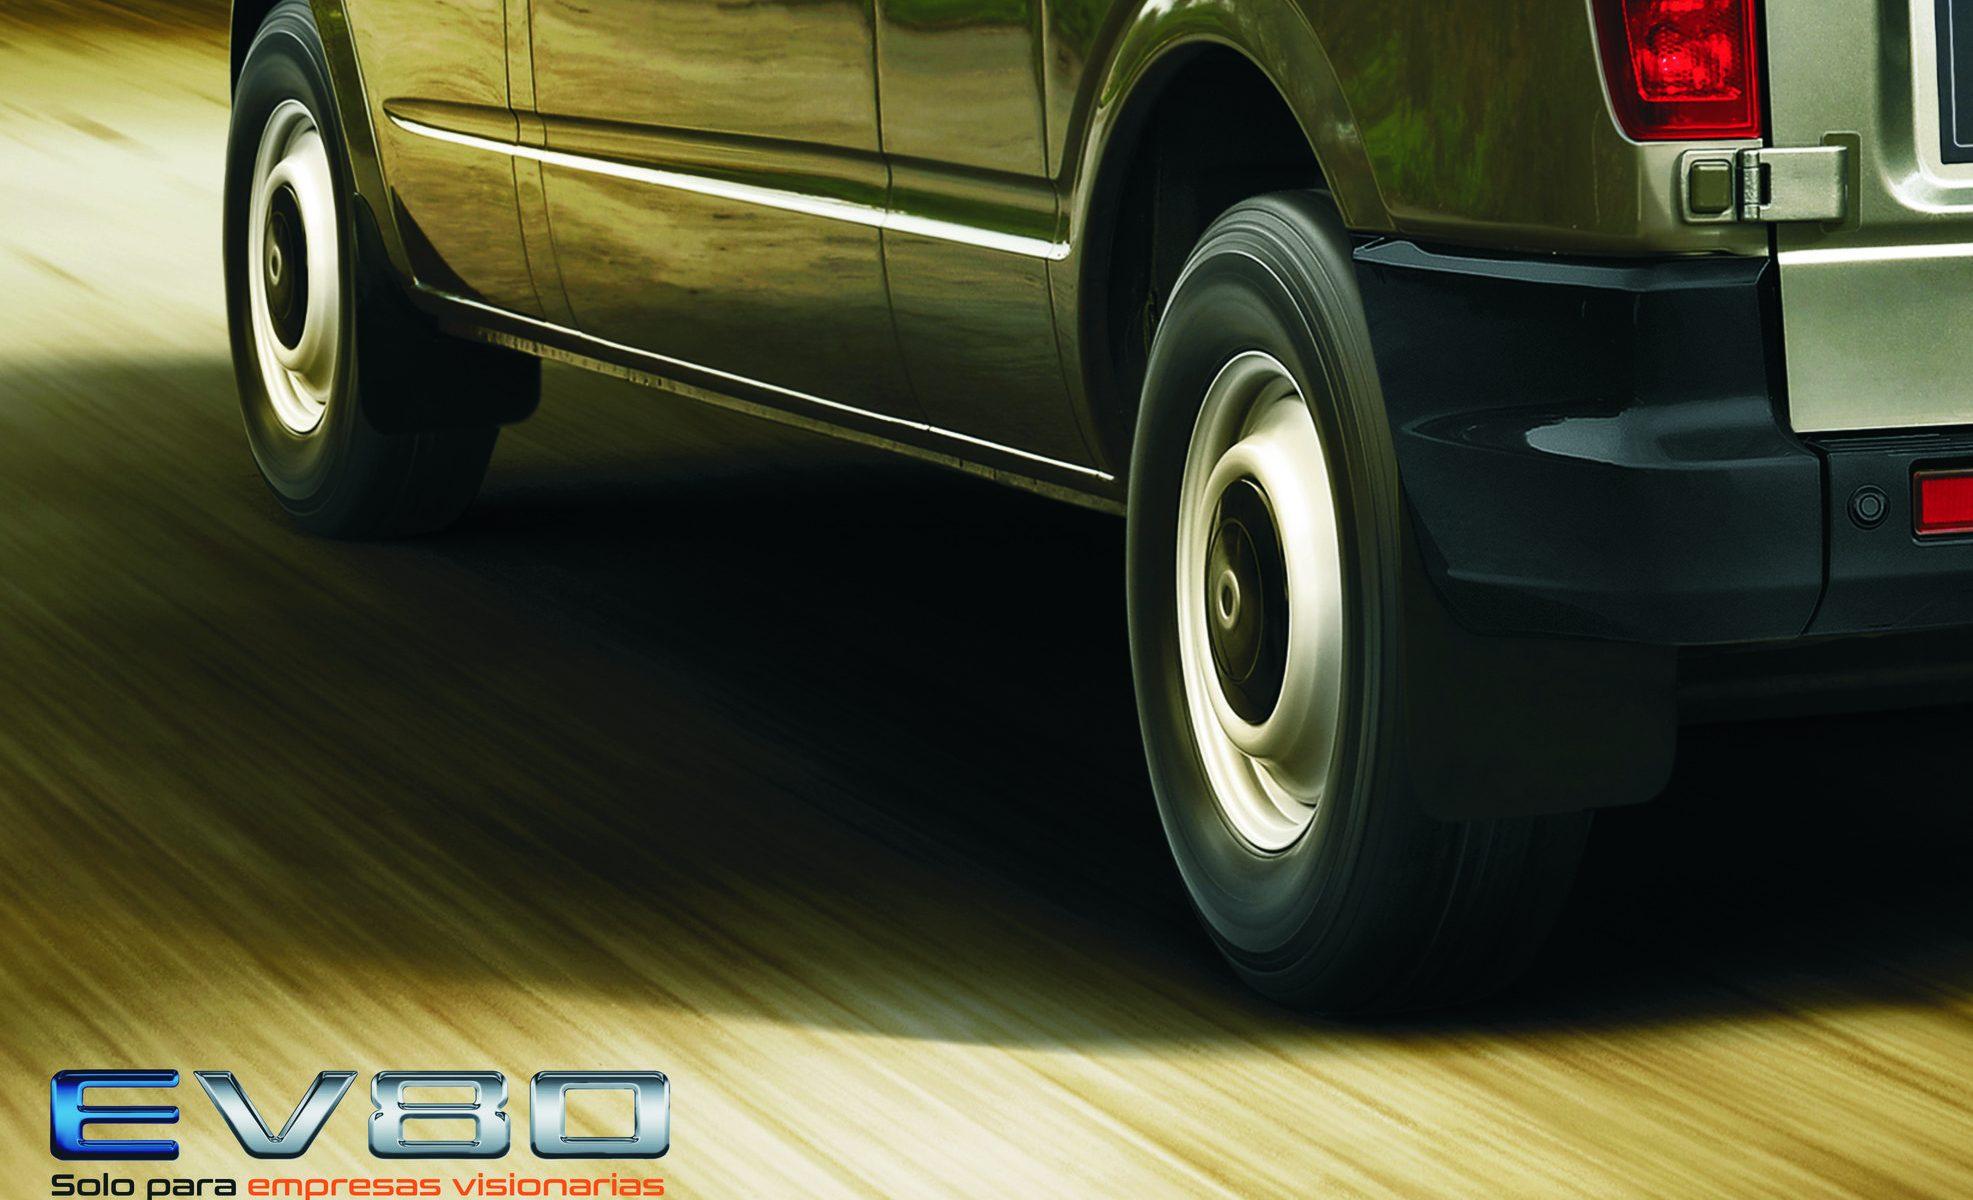 rsz_maxus_ev80_furgoneta_electrica